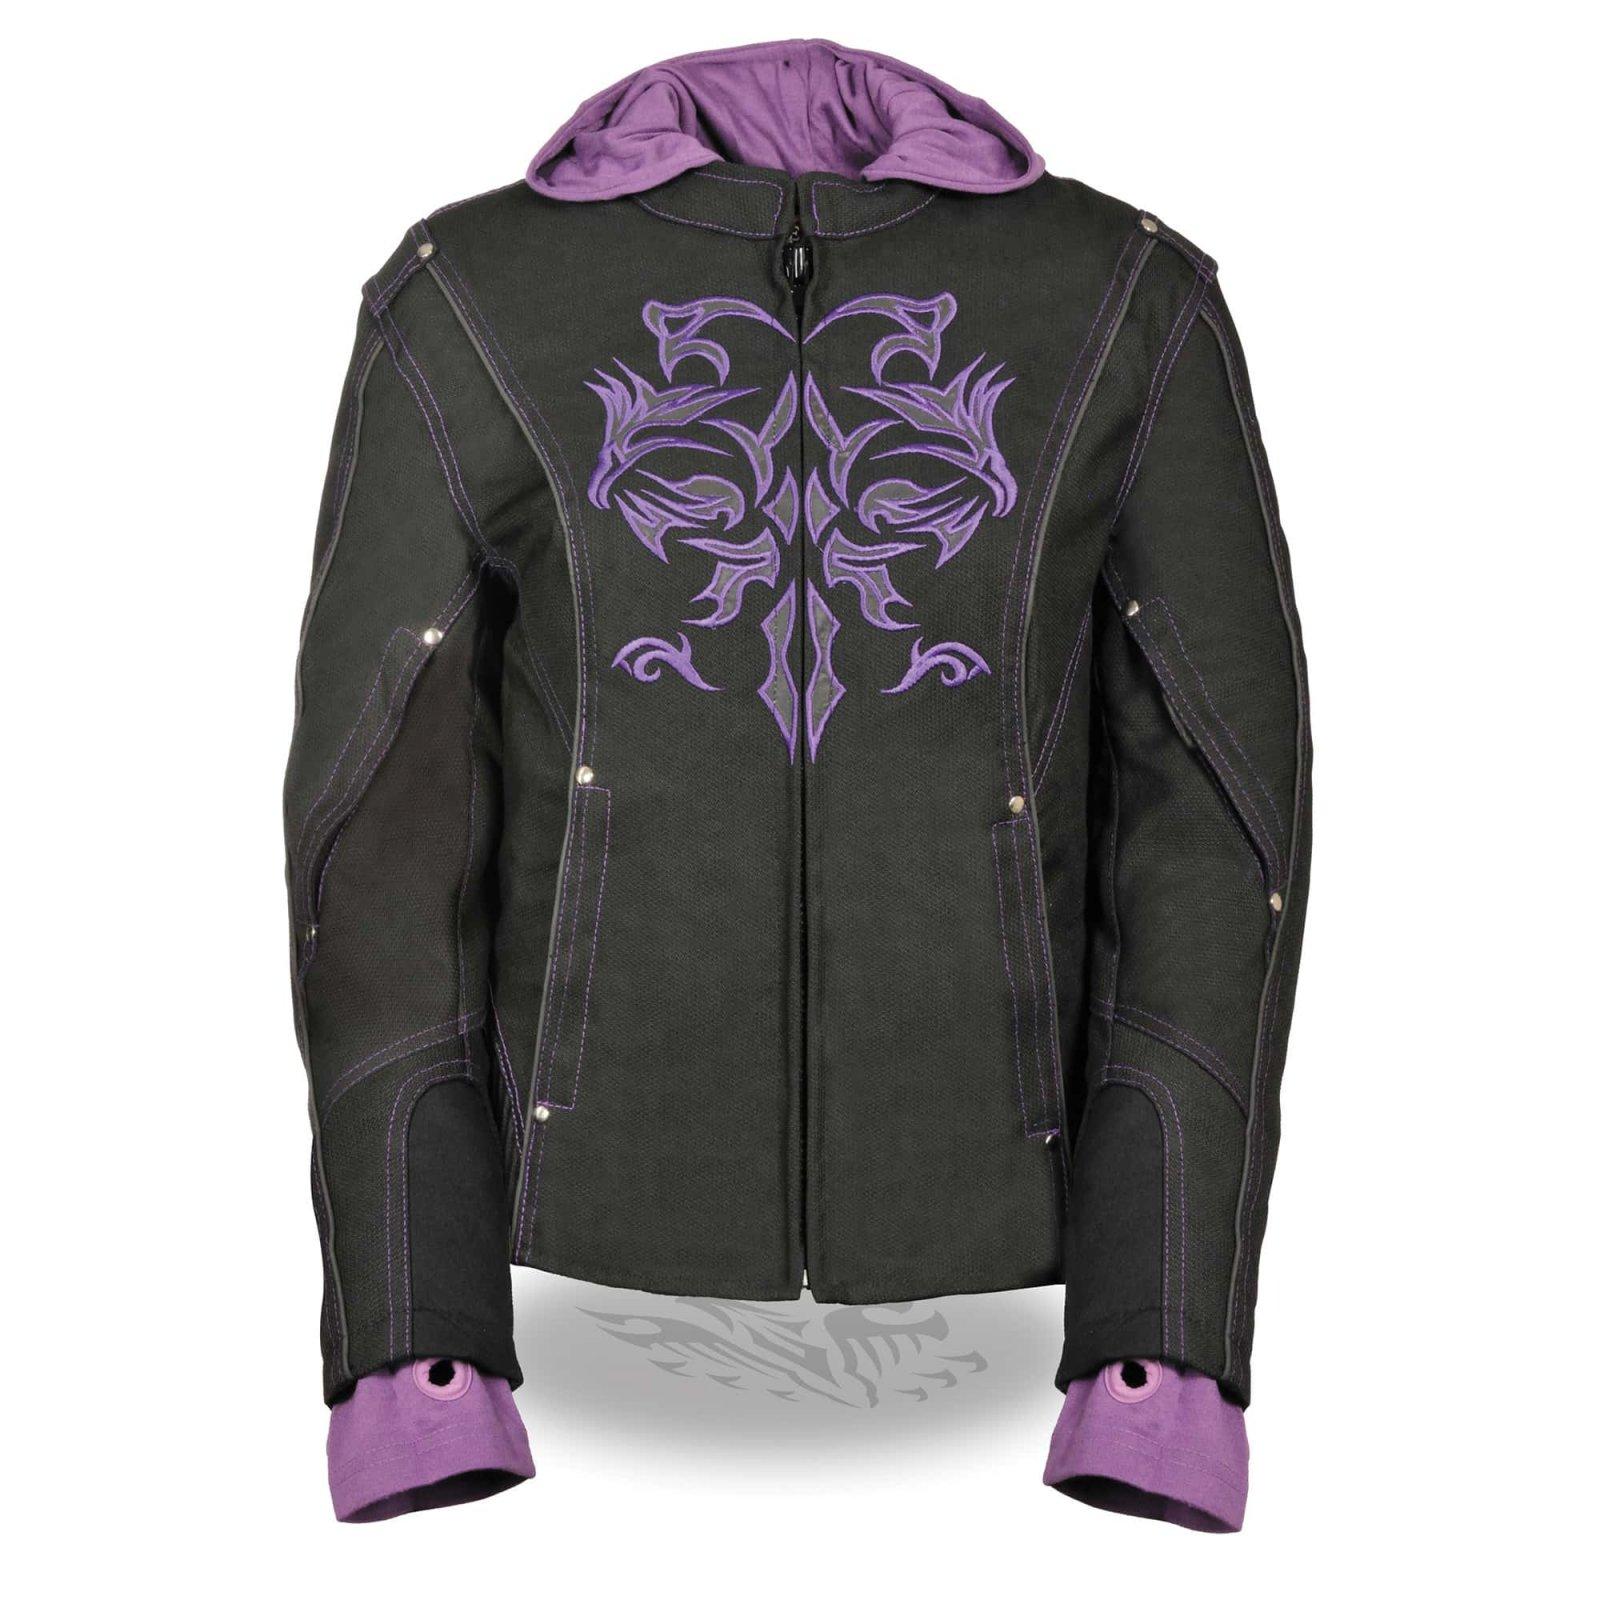 Women's 3/4 Jacket w/ Reflective Tribal Detail Textile